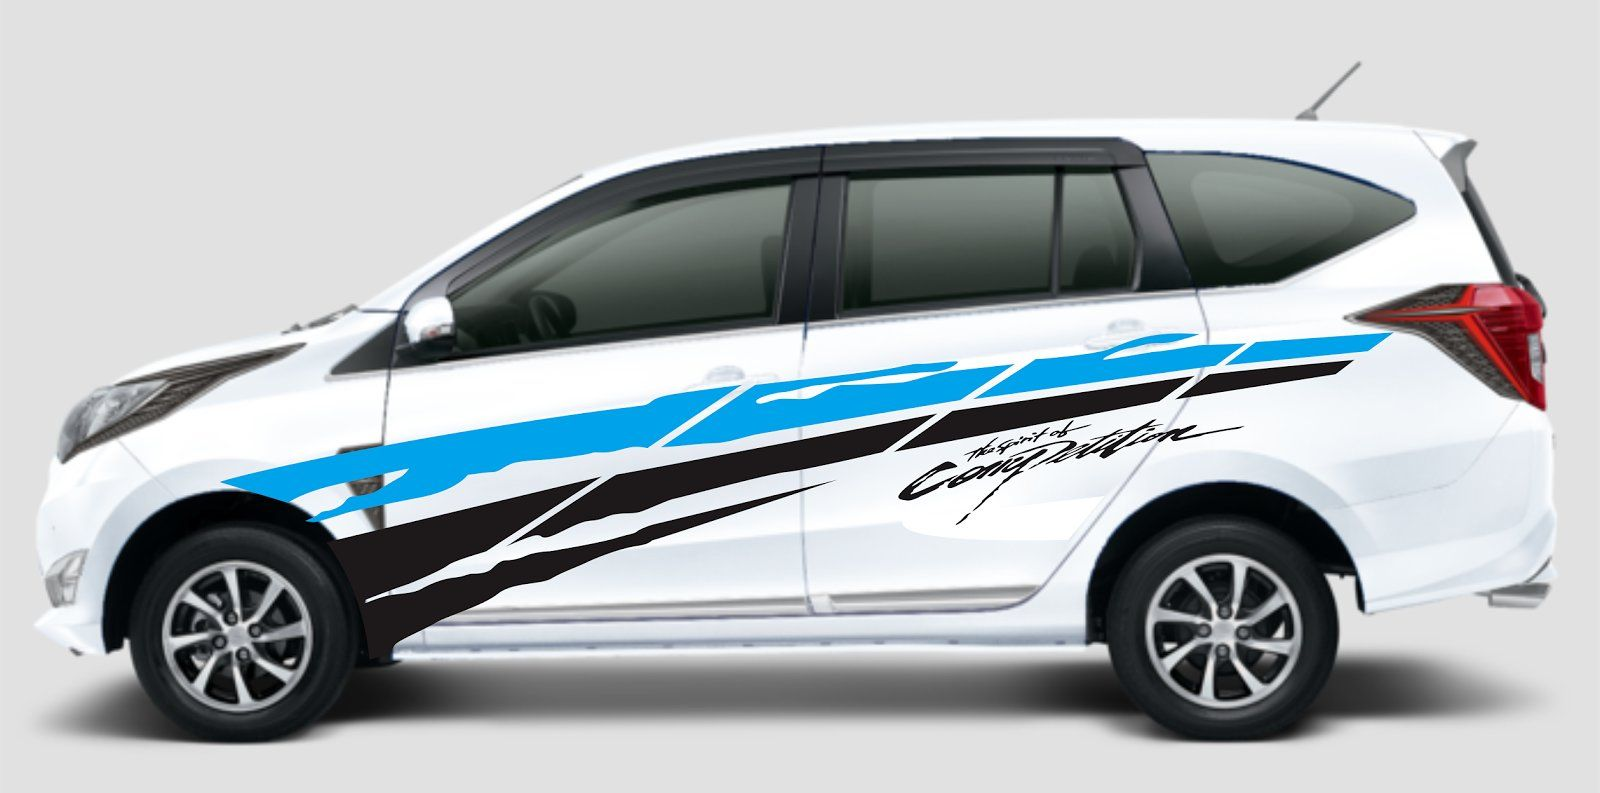 Modifikasi Stiker Mobil Sigra Stiker Mobil Mobil Konsep Mobil